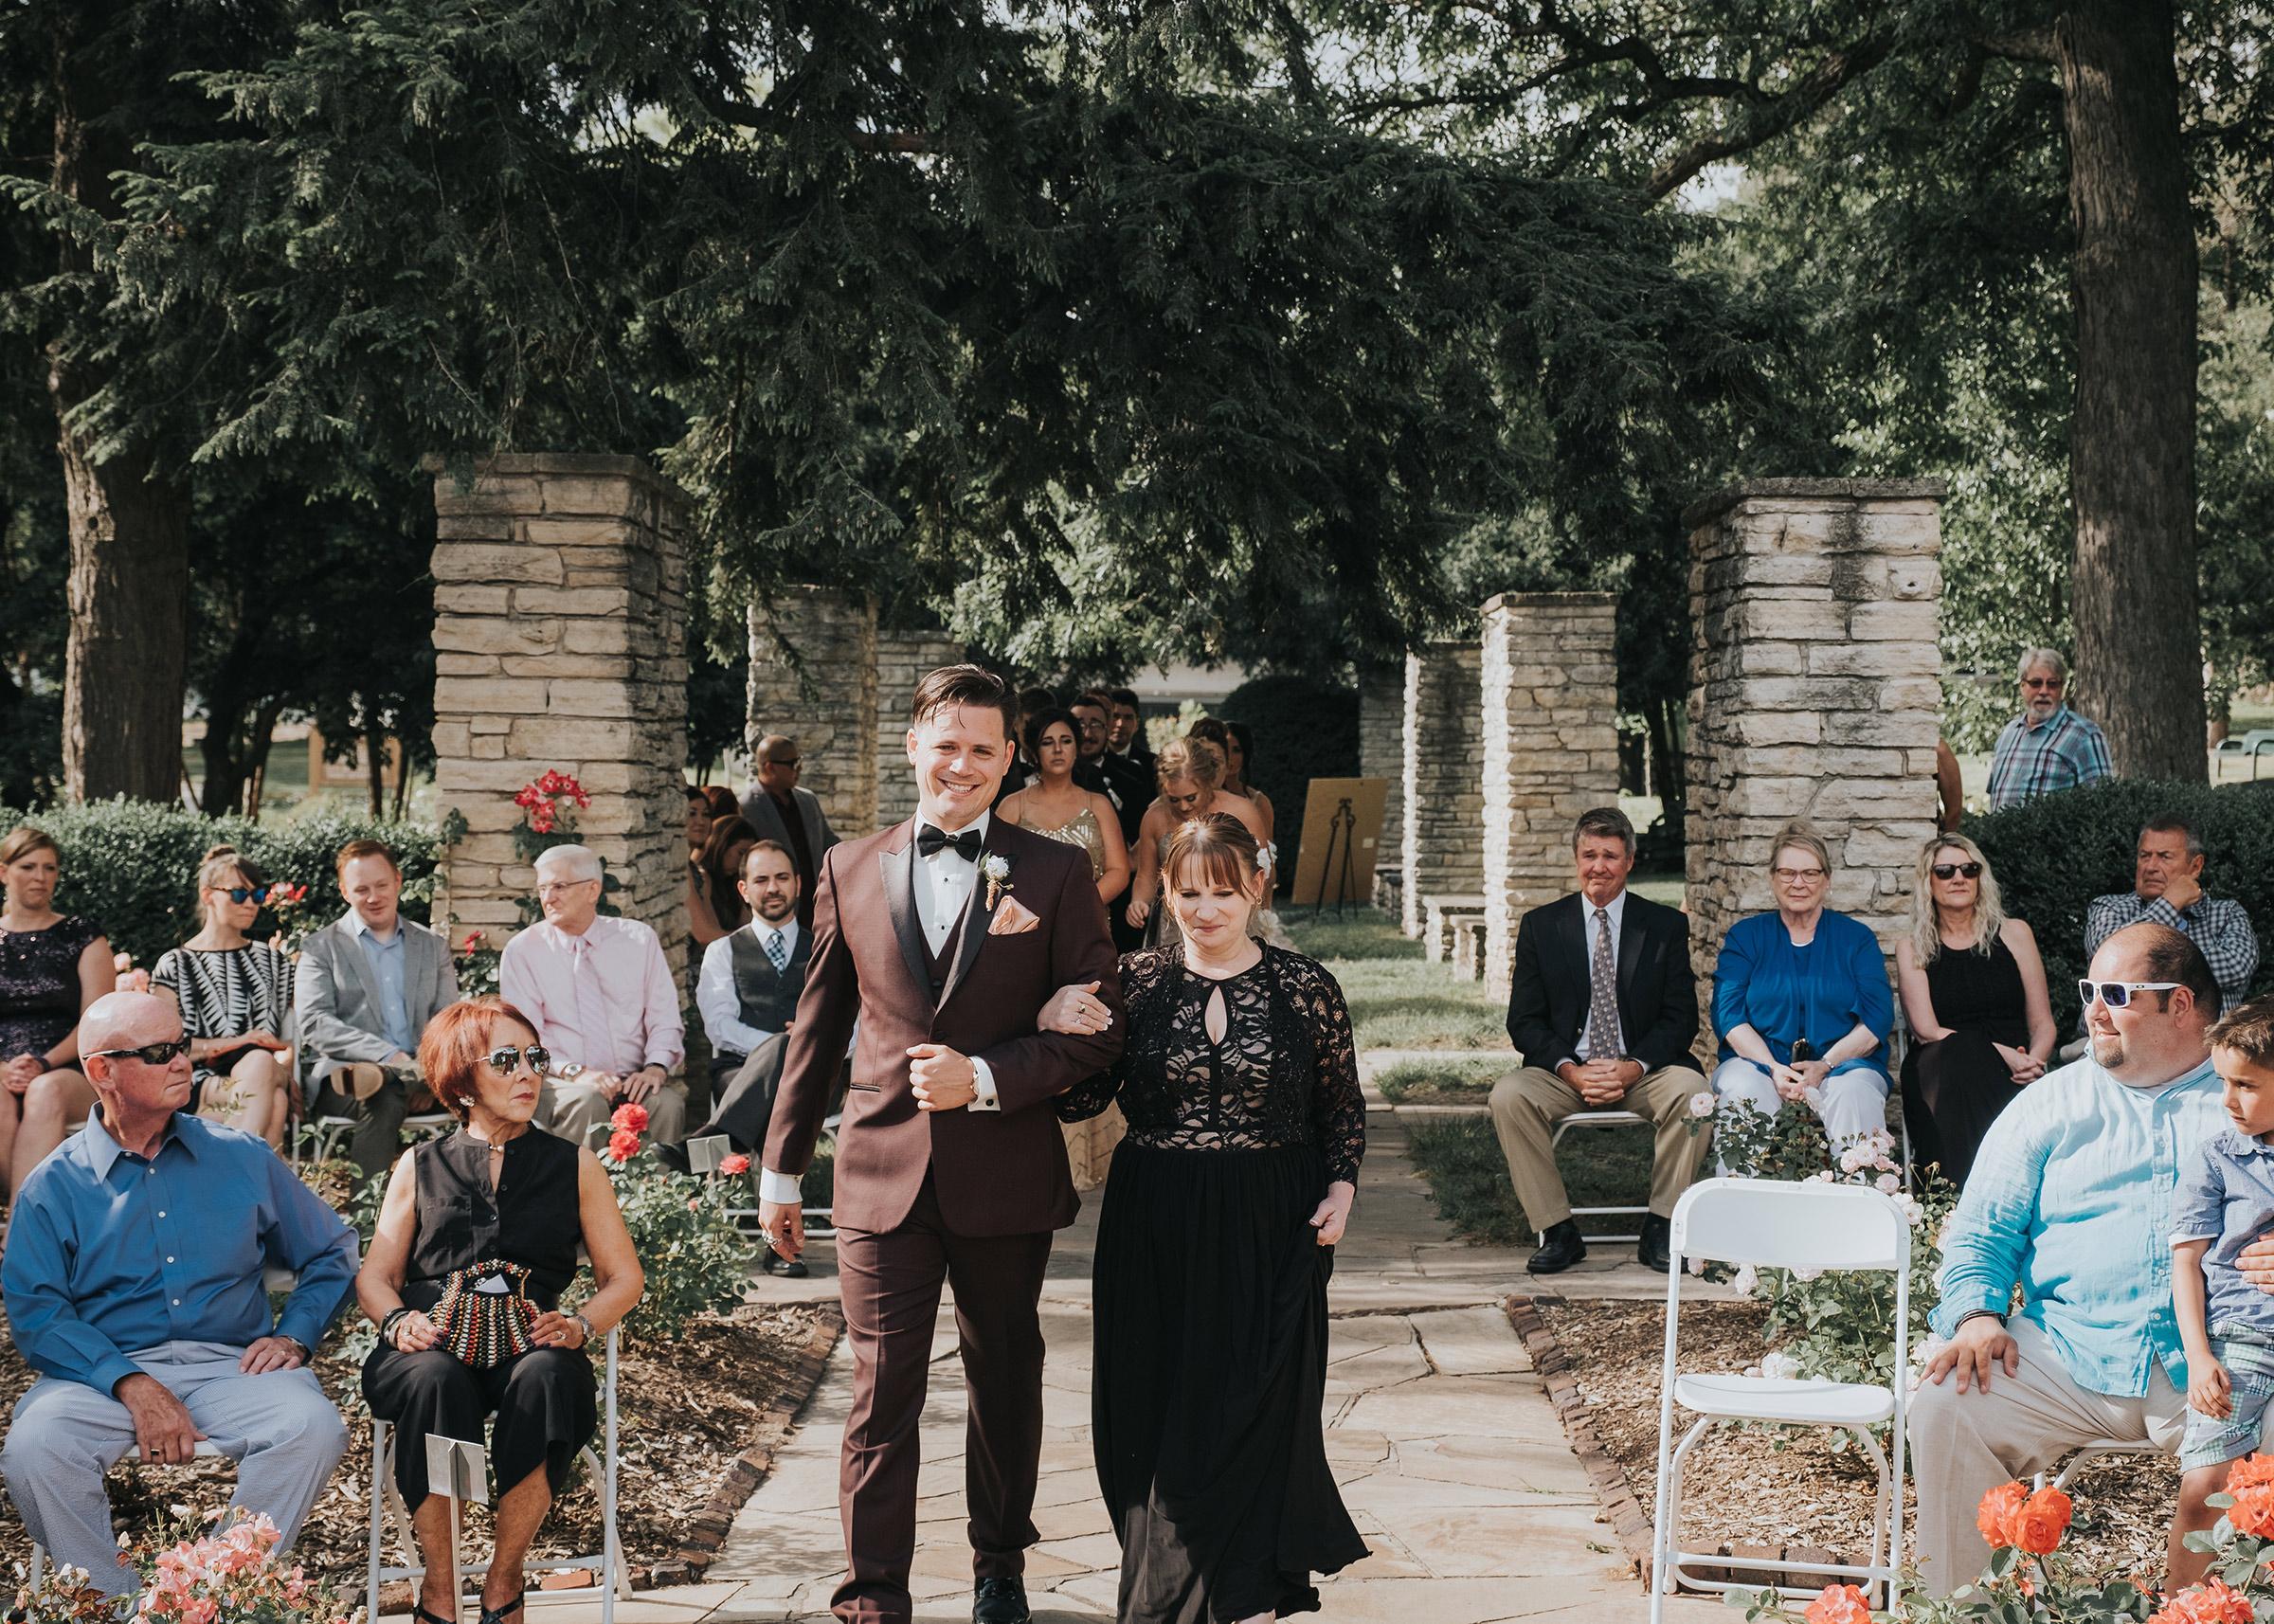 groom-walking-brides-mother-down-aisle-desmoines-iowa-rose-garden-raelyn-ramey-photography.jpg